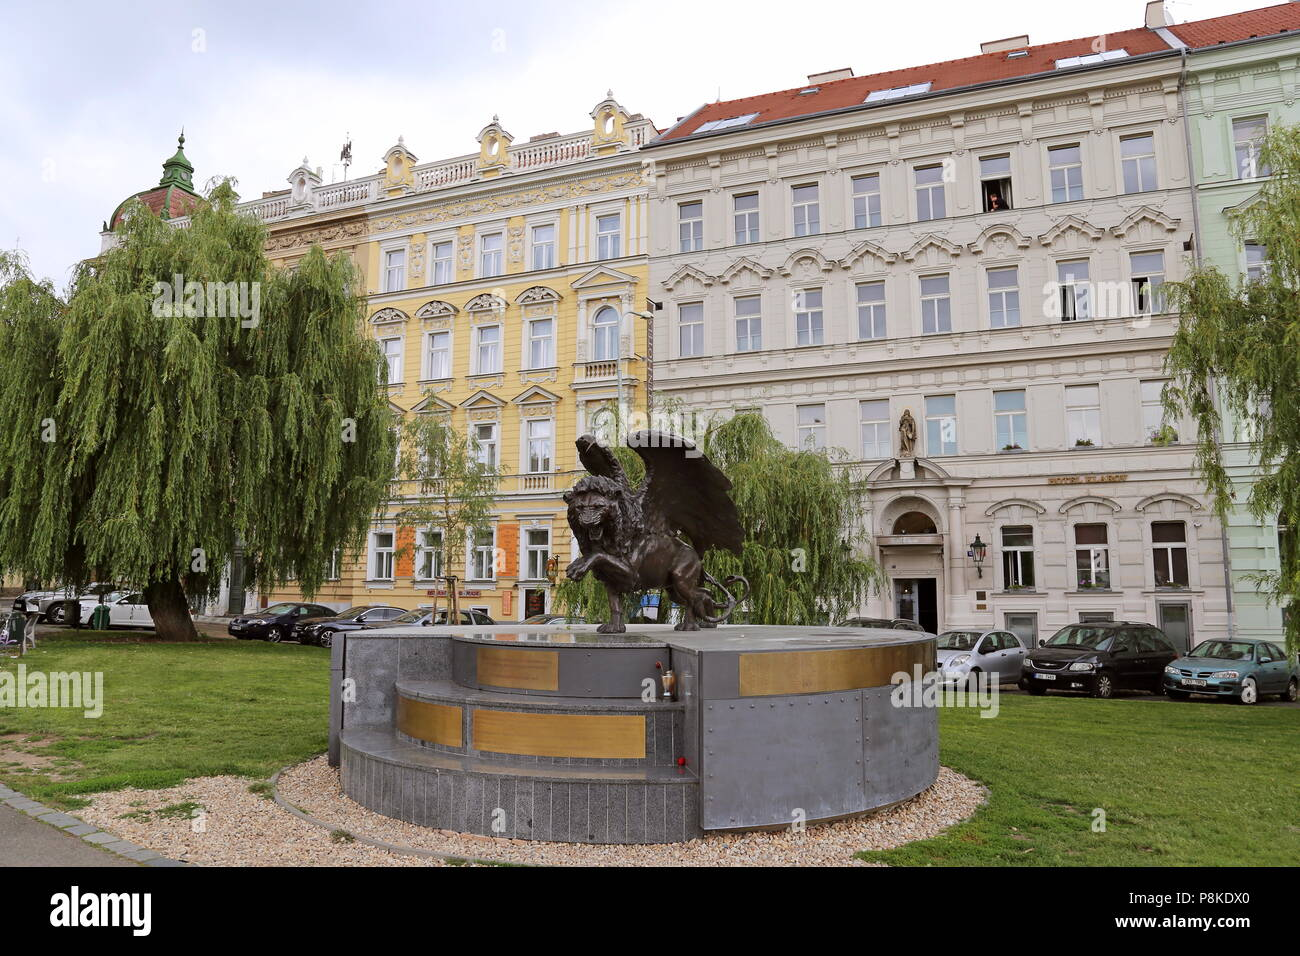 Memorial to Czech and Slovak pilots who flew with the RAF during WW2. Klárov, Malá Strana (Little Quarter), Prague, Czechia (Czech Republic), Europe - Stock Image